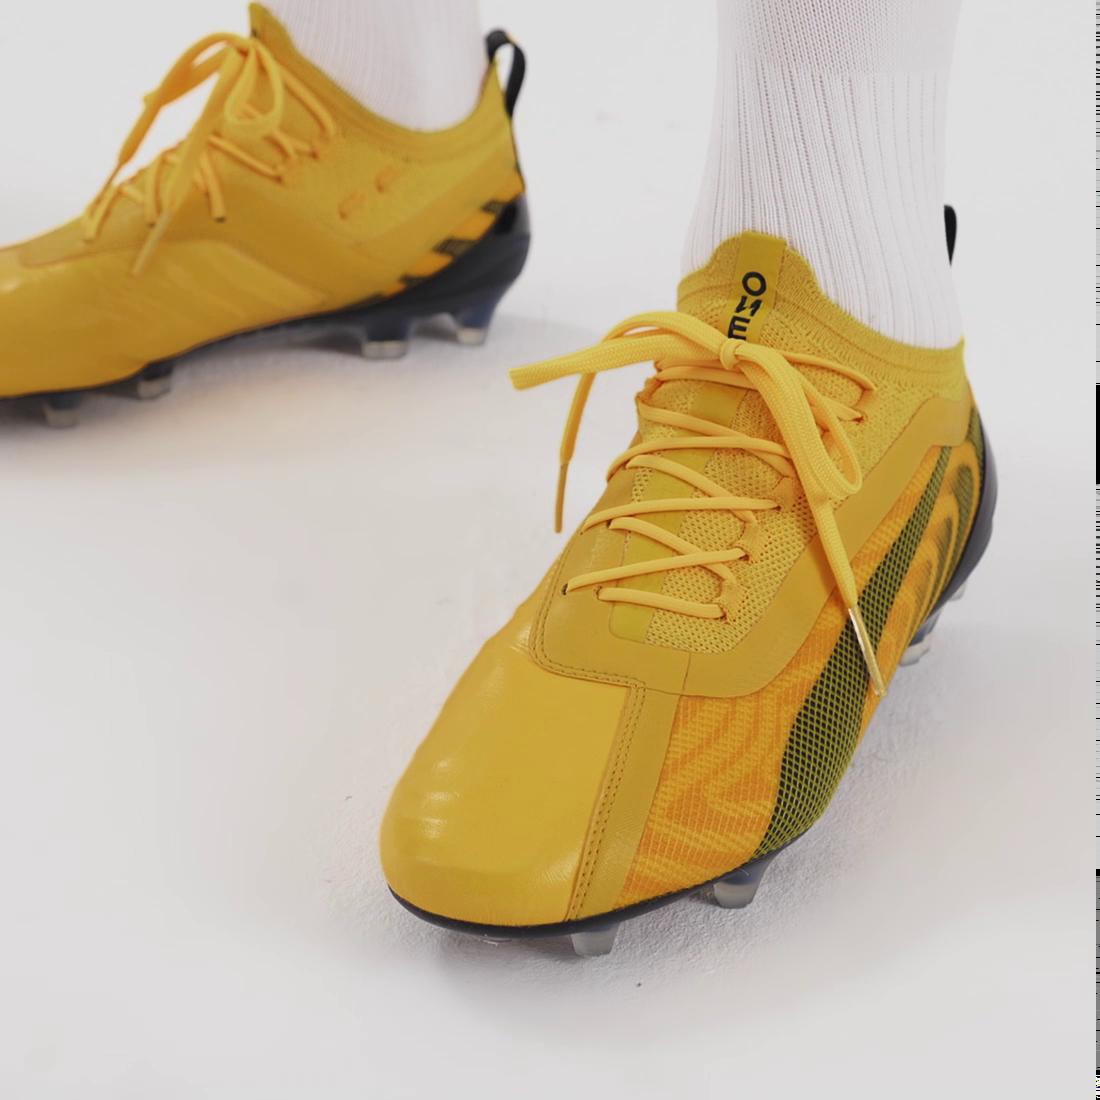 Image PUMA PUMA ONE 20.1 FG/AG Men's Football Boots #8